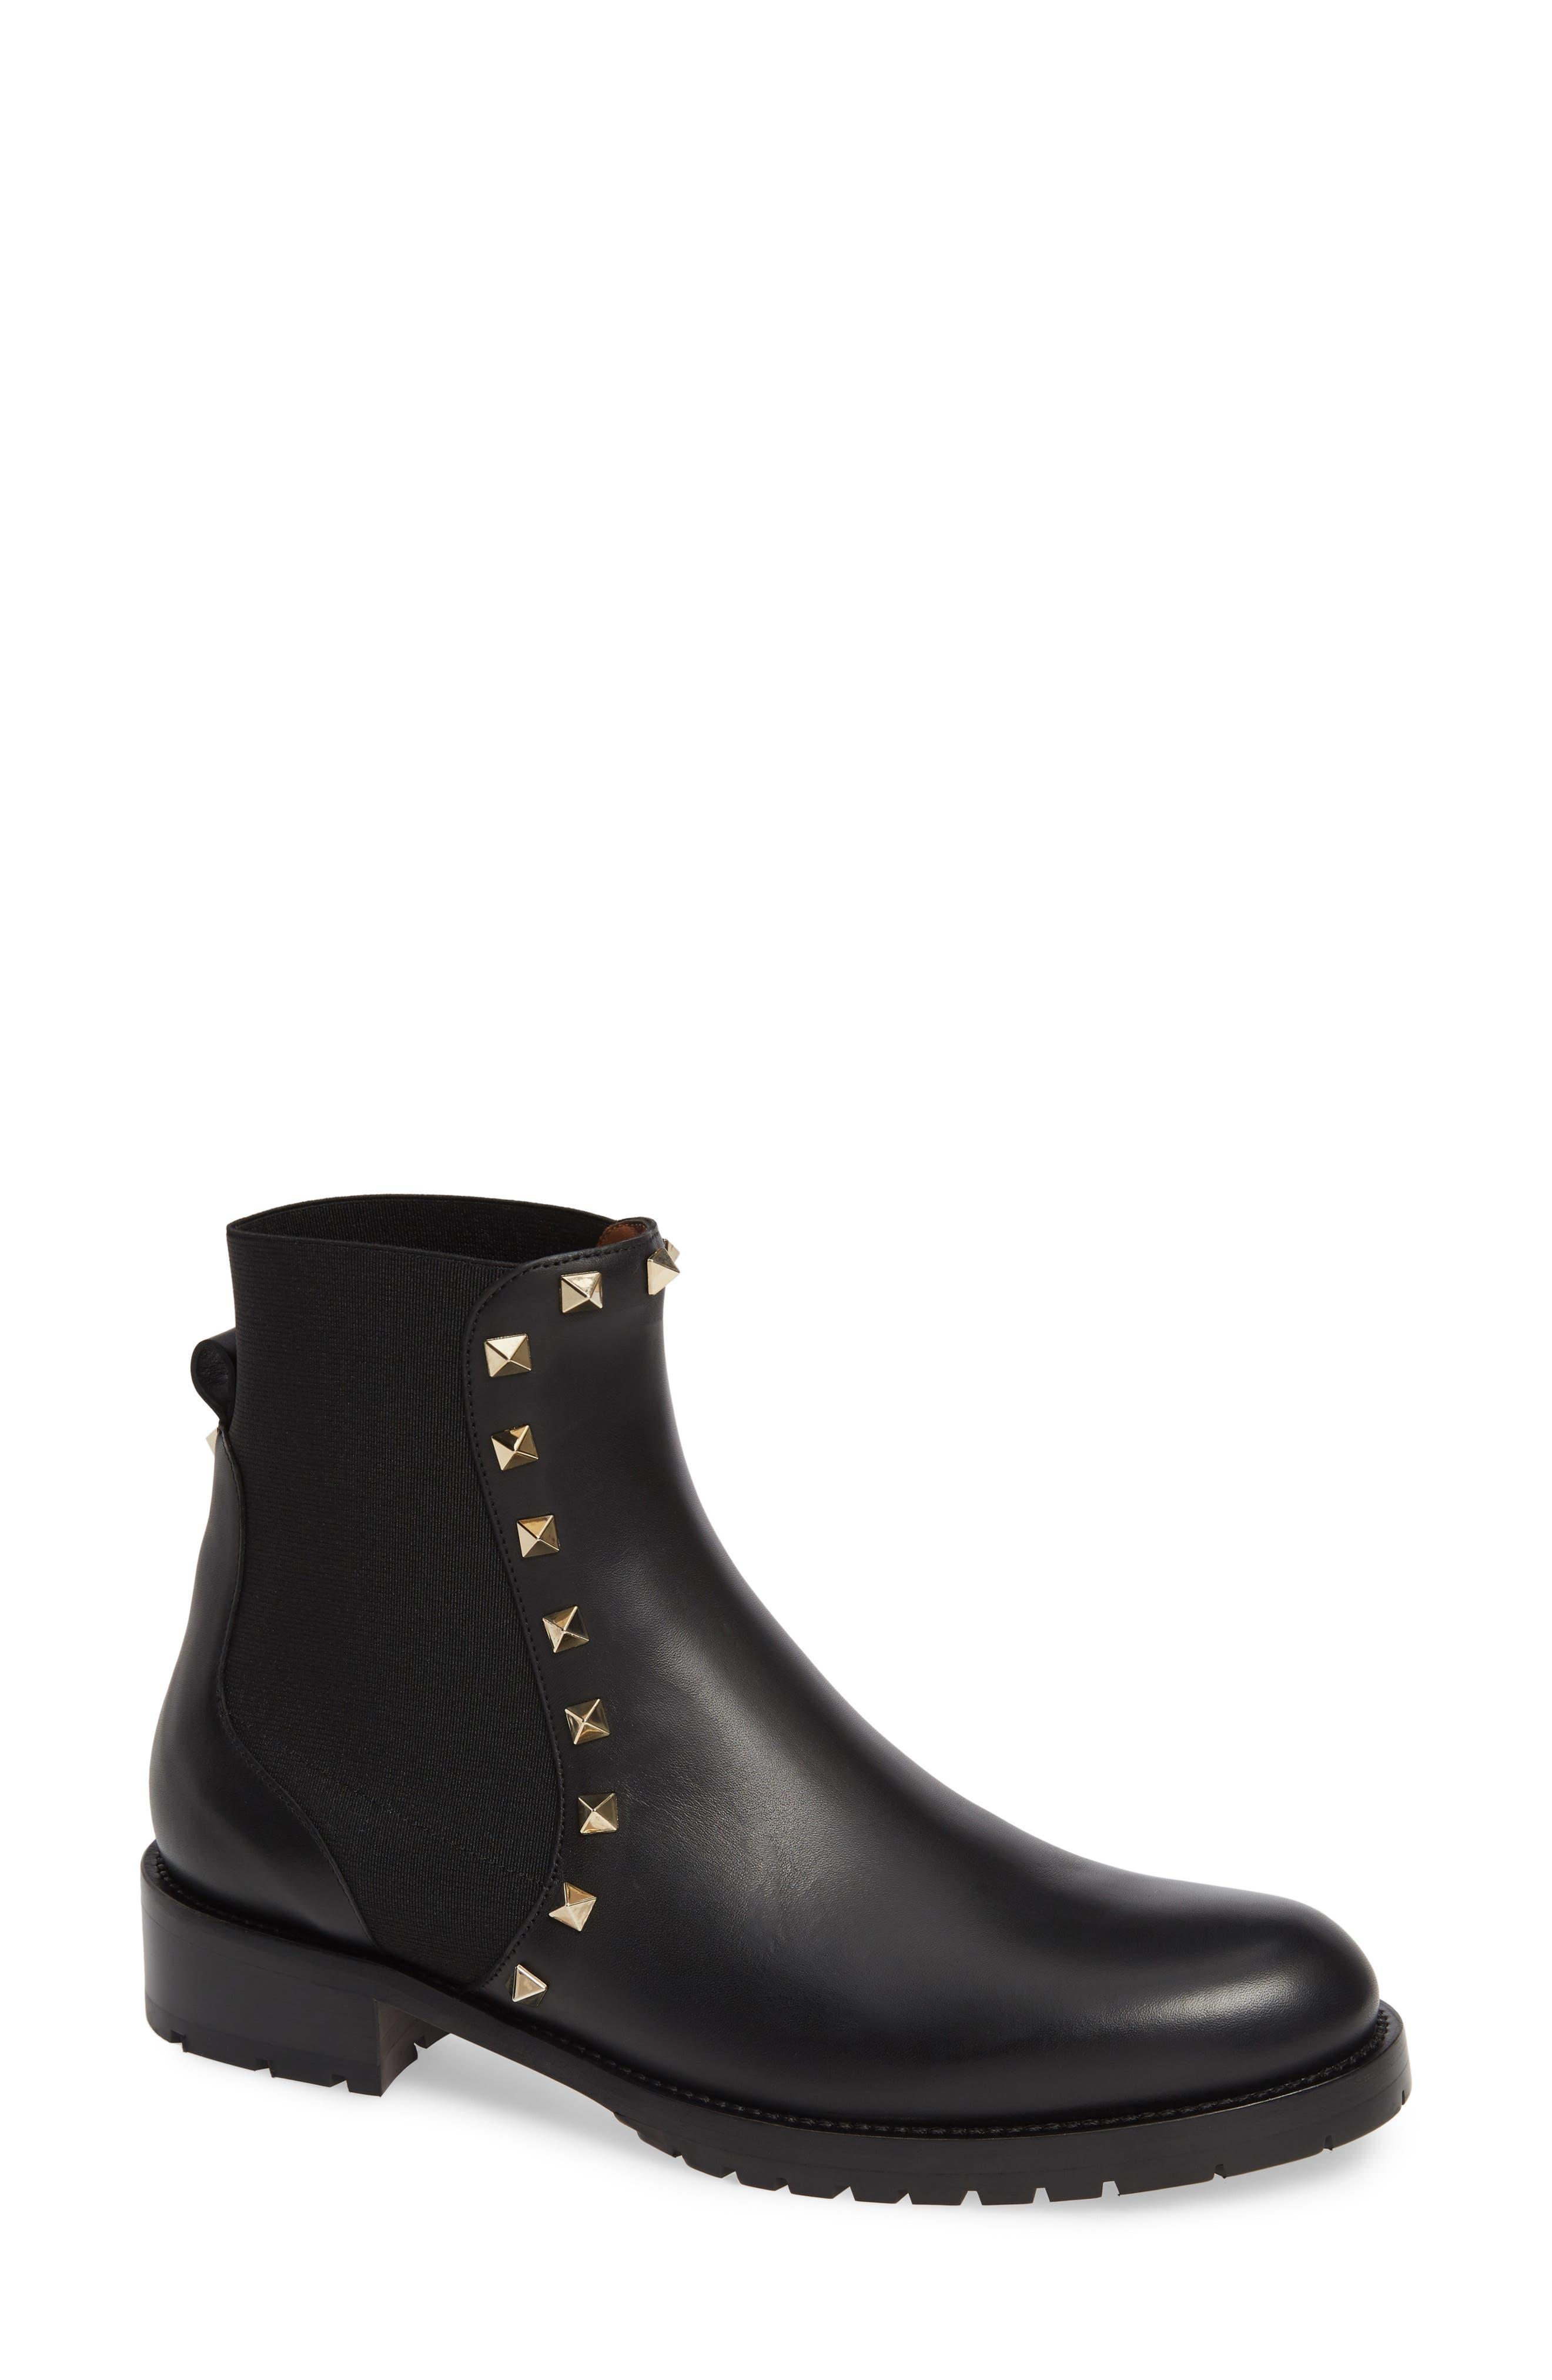 Valentino Garavani Beatle Rockstud Boot